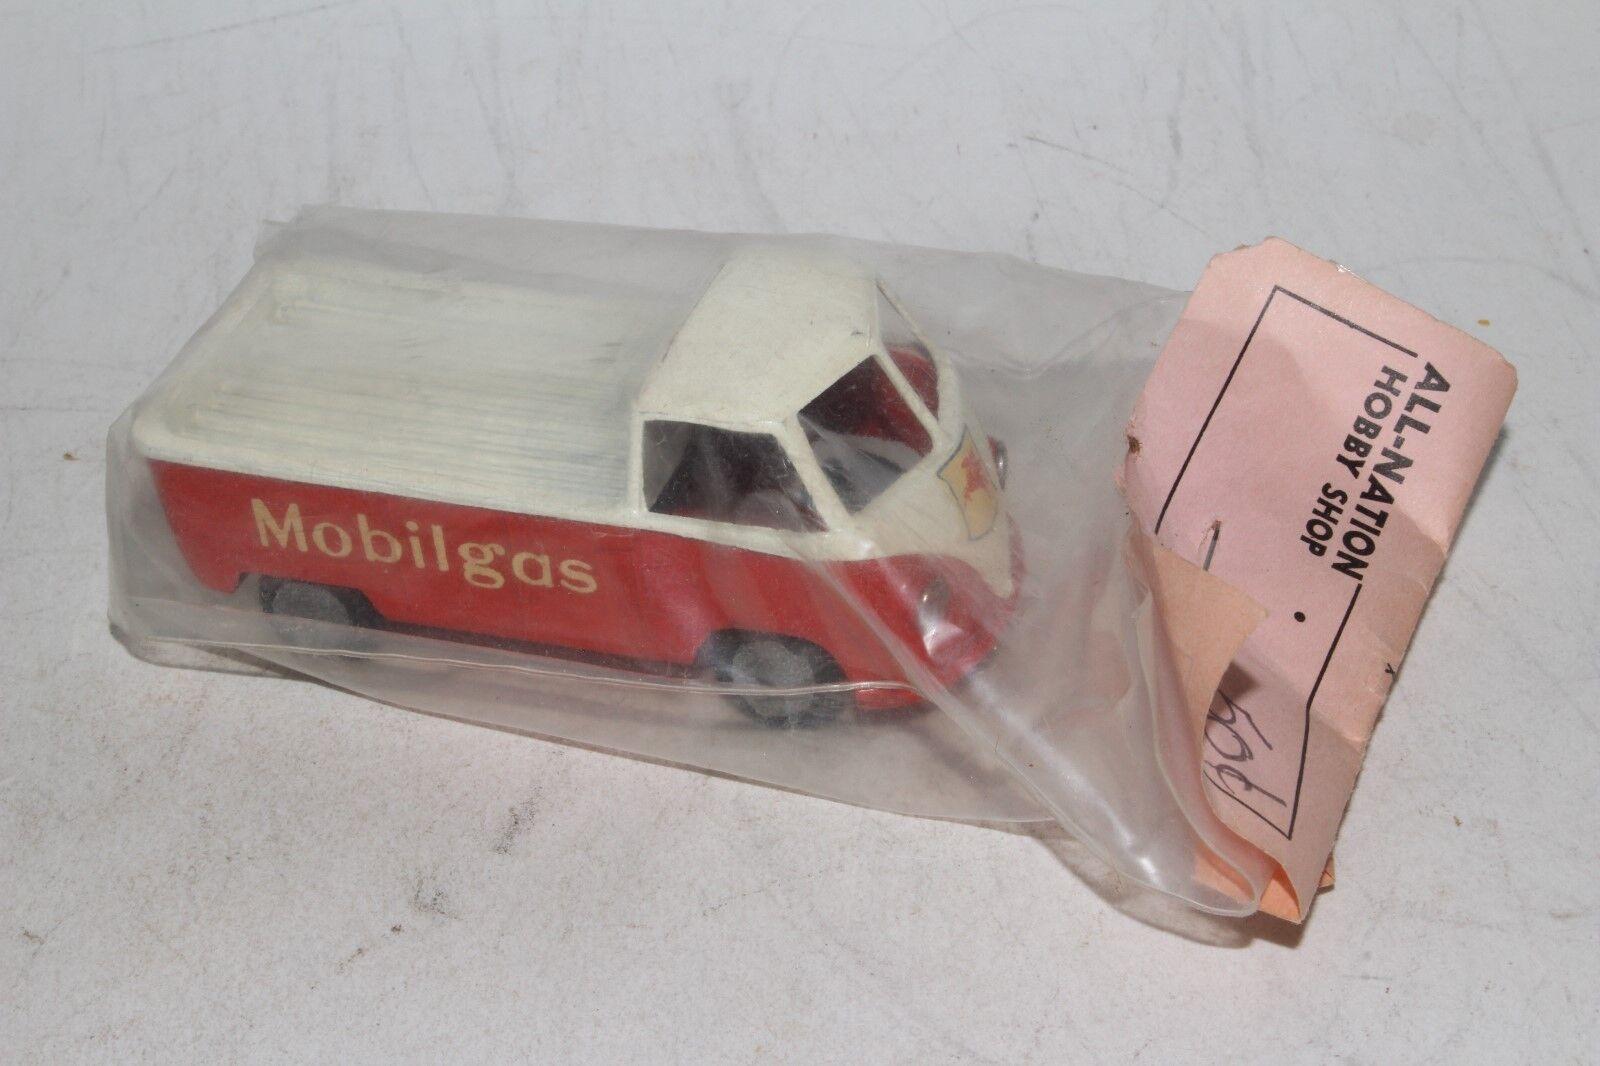 Tekno Toys 1950 s Volkswagen Mobil Oil Pickup Packed in Header väska